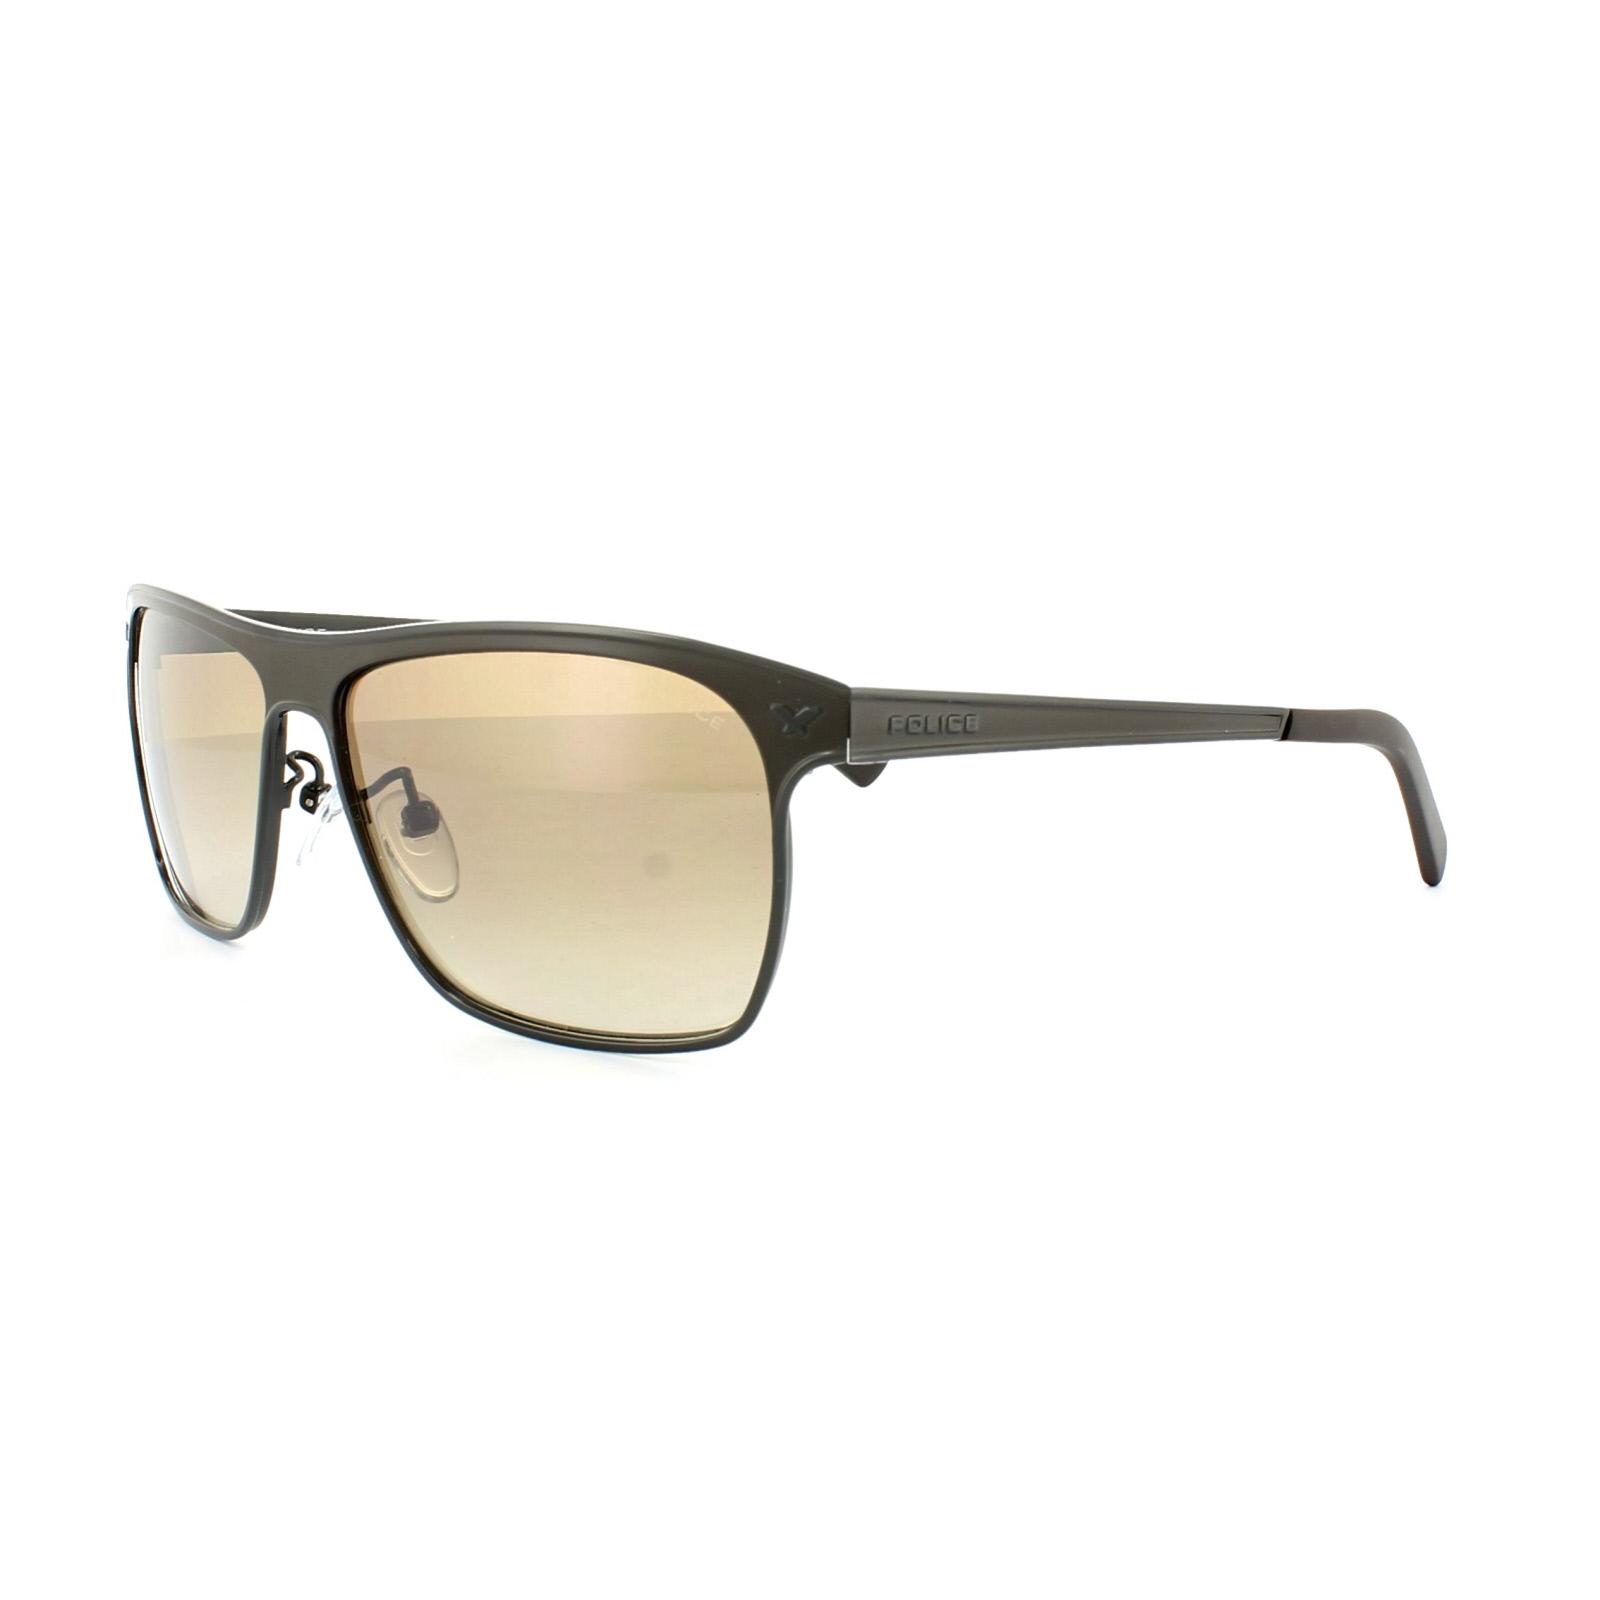 d4297a0cc72 Sentinel Thumbnail 1. Sentinel Police Sunglasses S8948 History ...